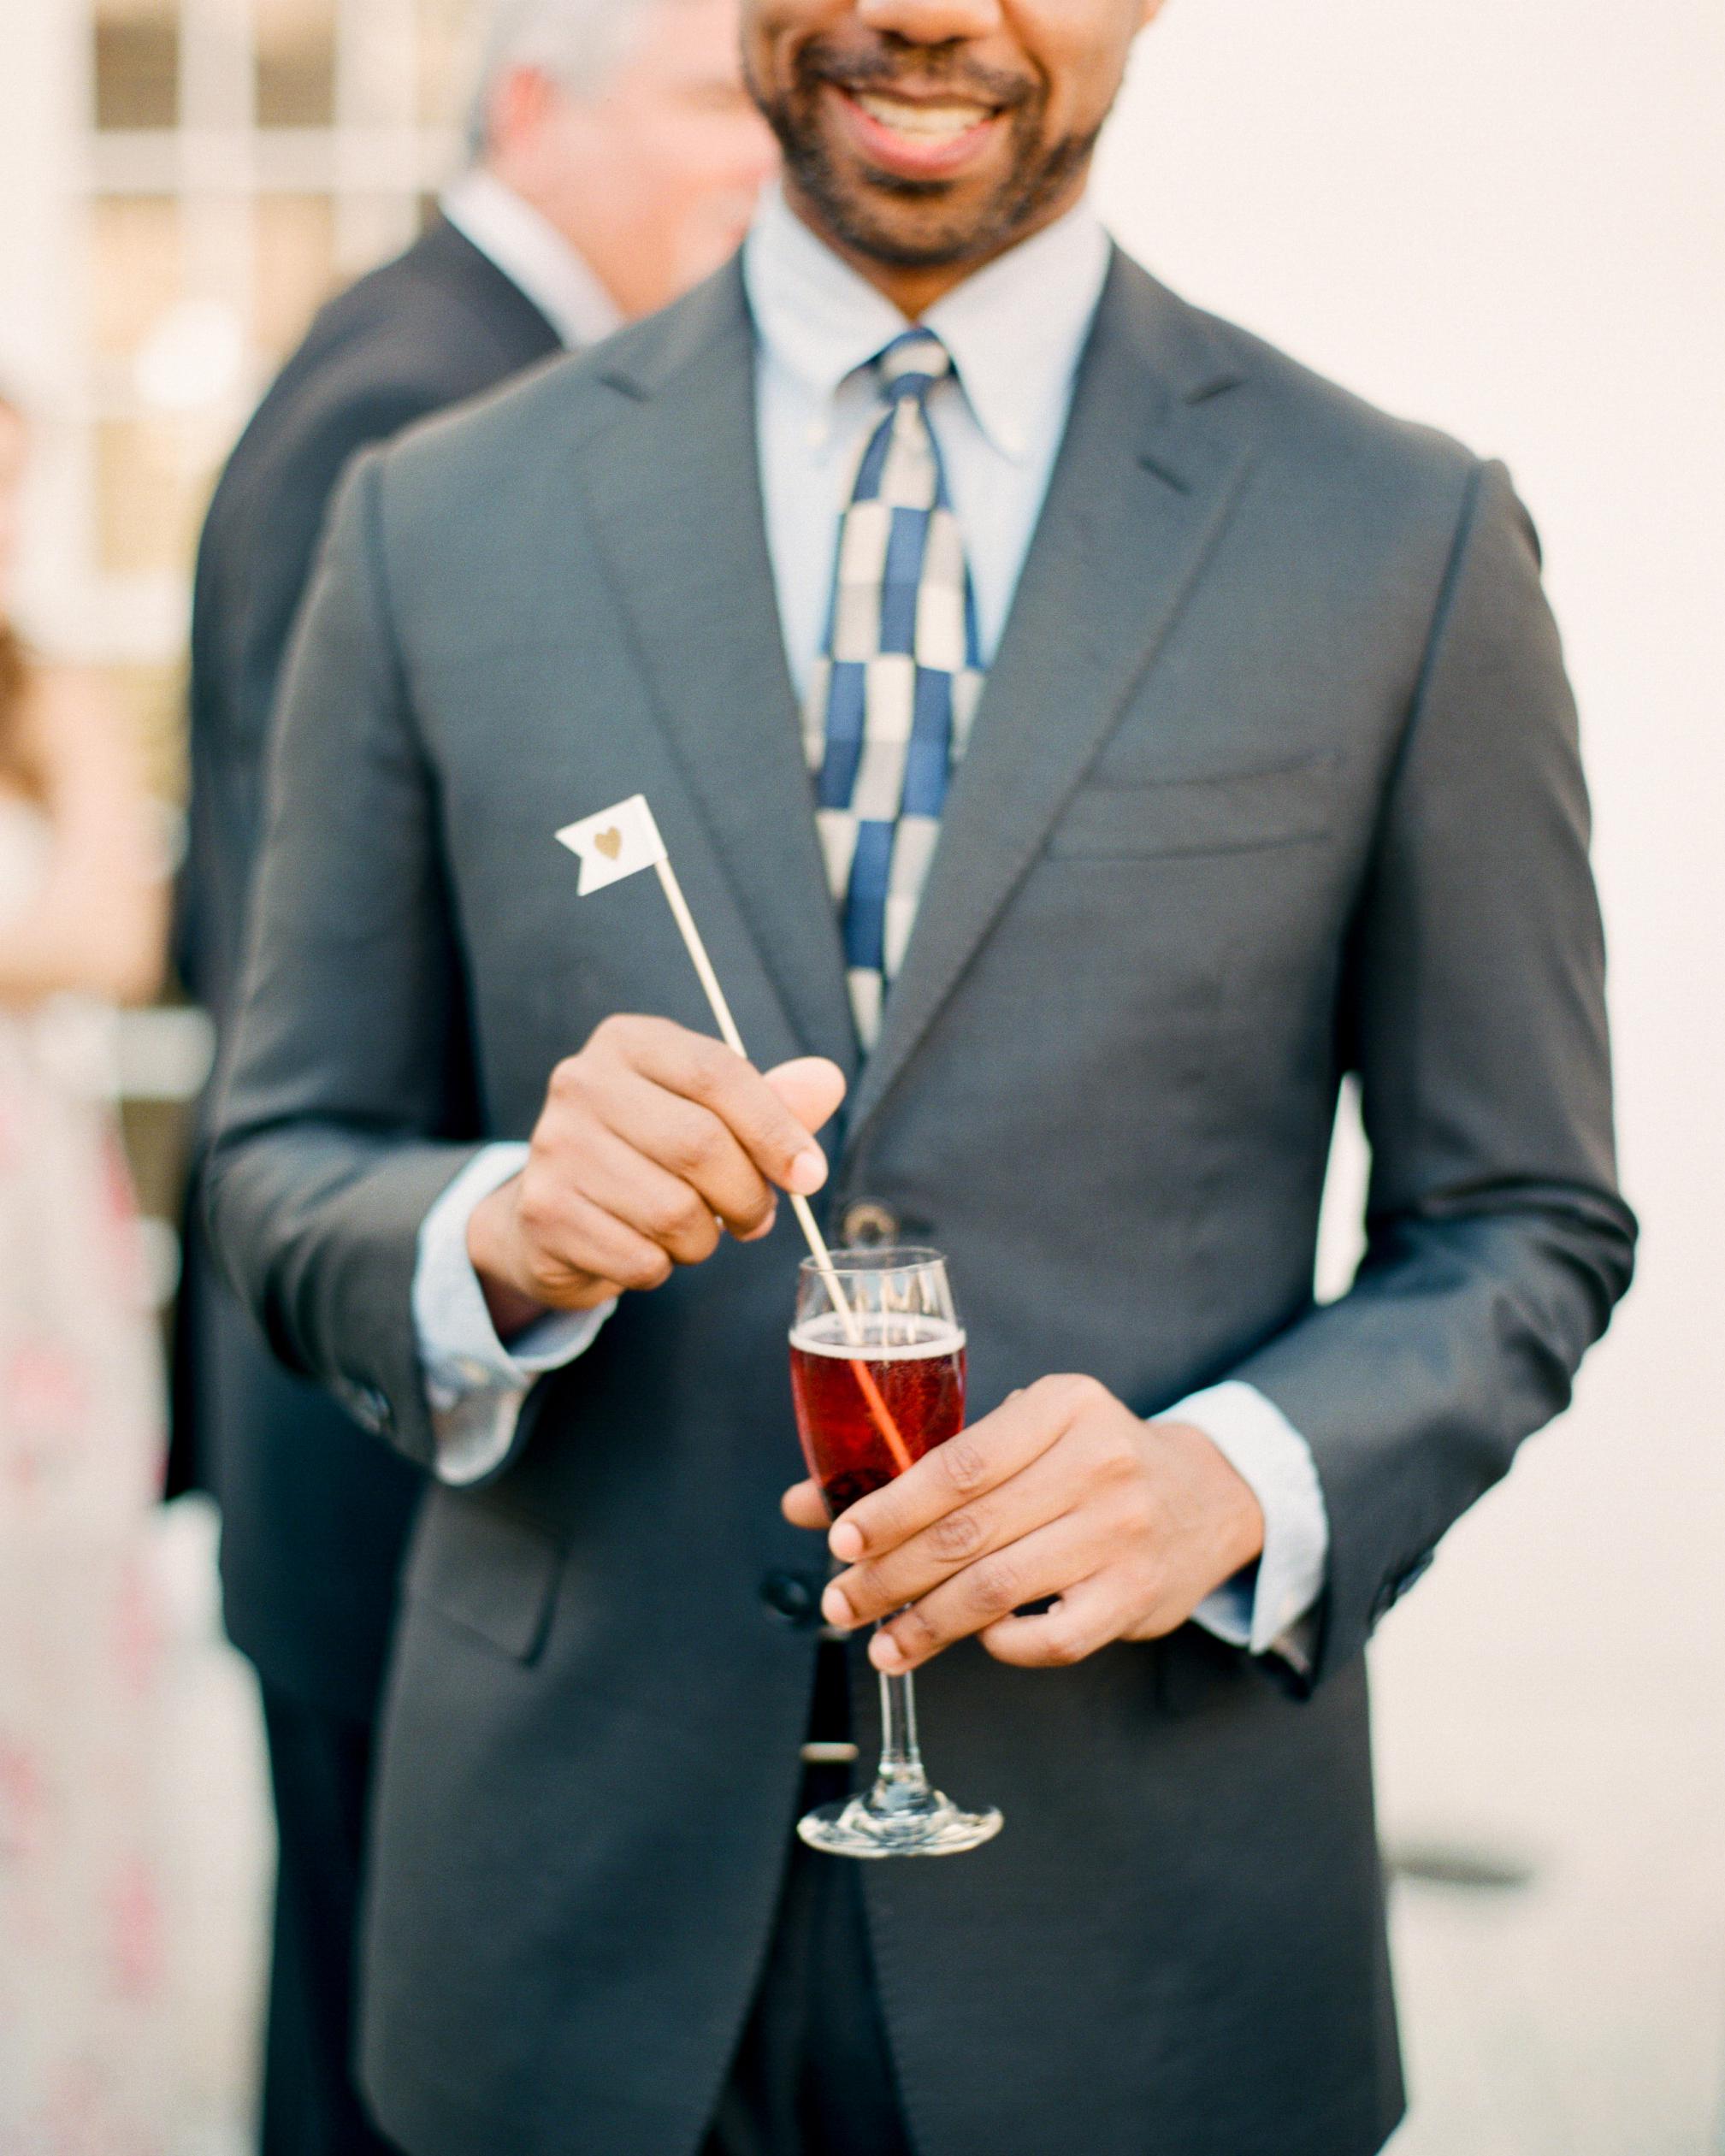 jennifer-adrien-wedding-drink-0614.jpg